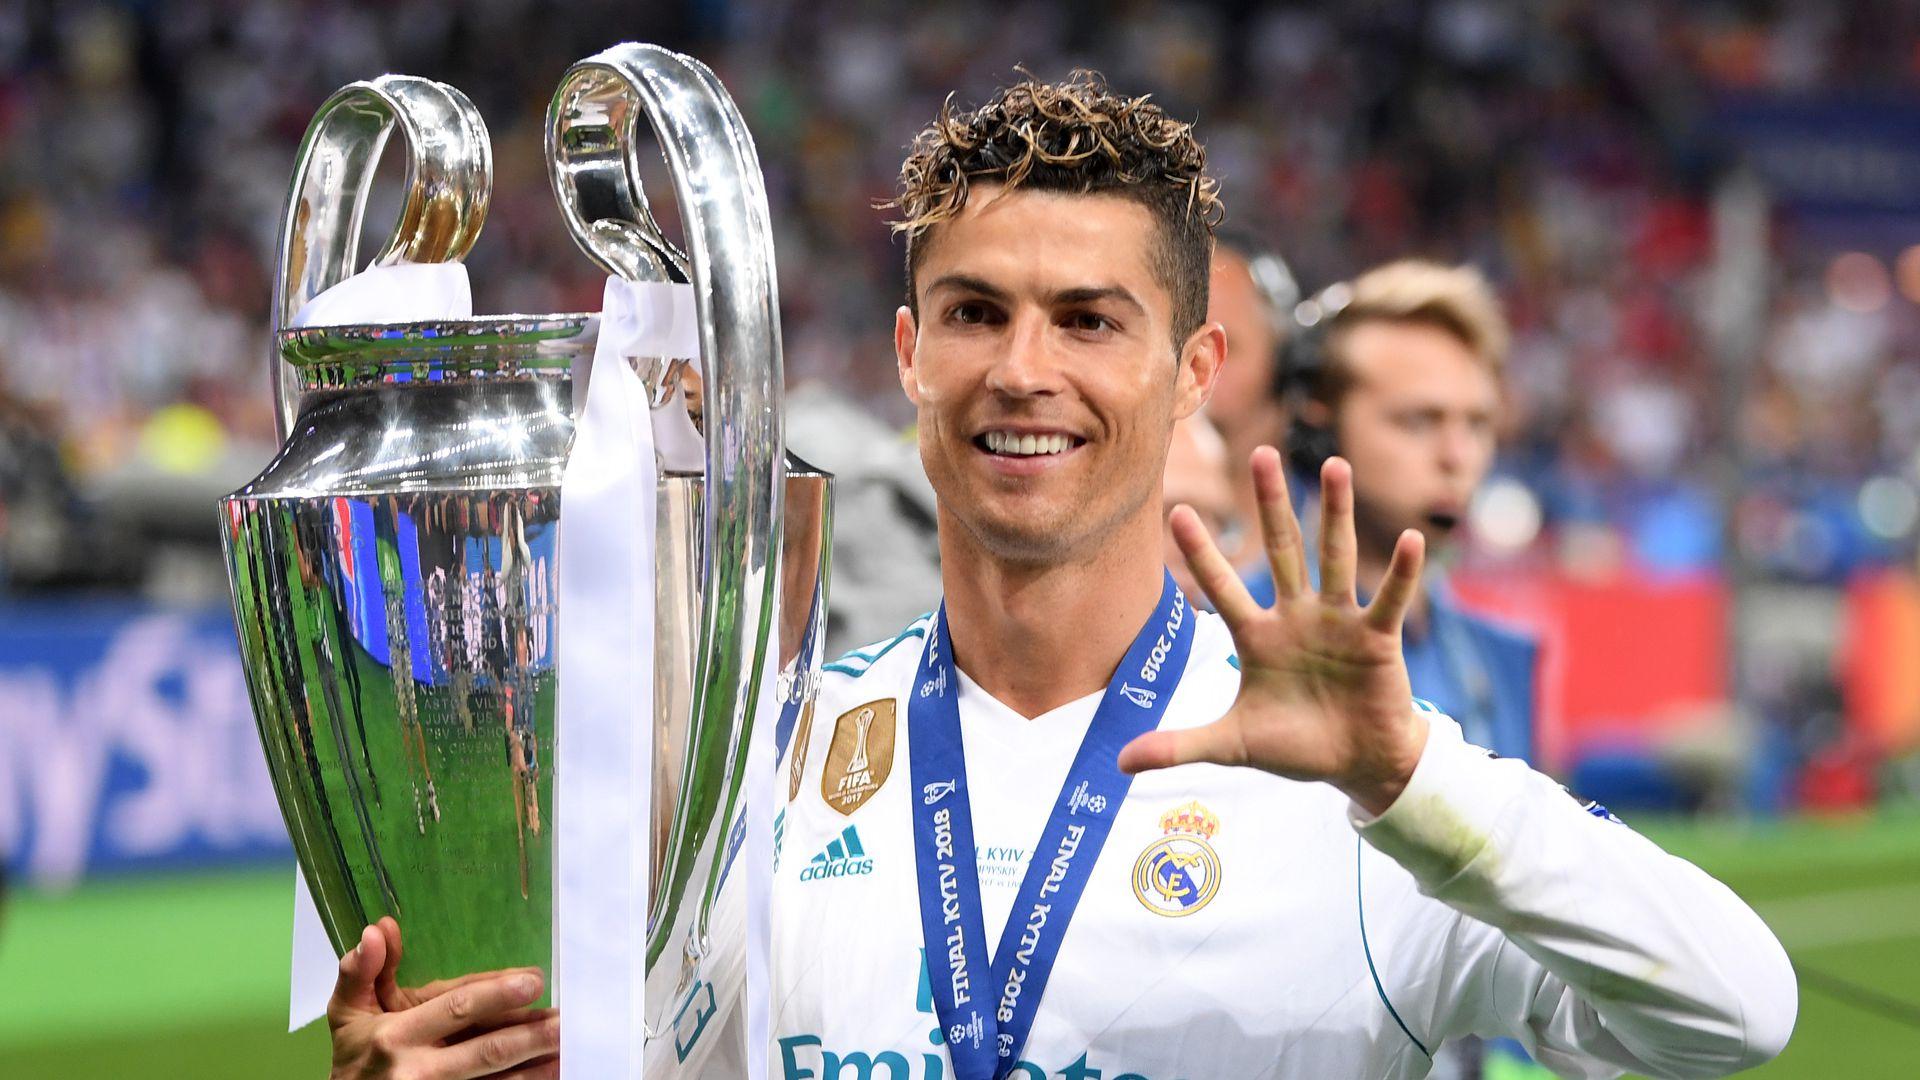 Neue Frisur Sitzt Cristiano Ronaldo Ist Bereit Fur Wm 2018